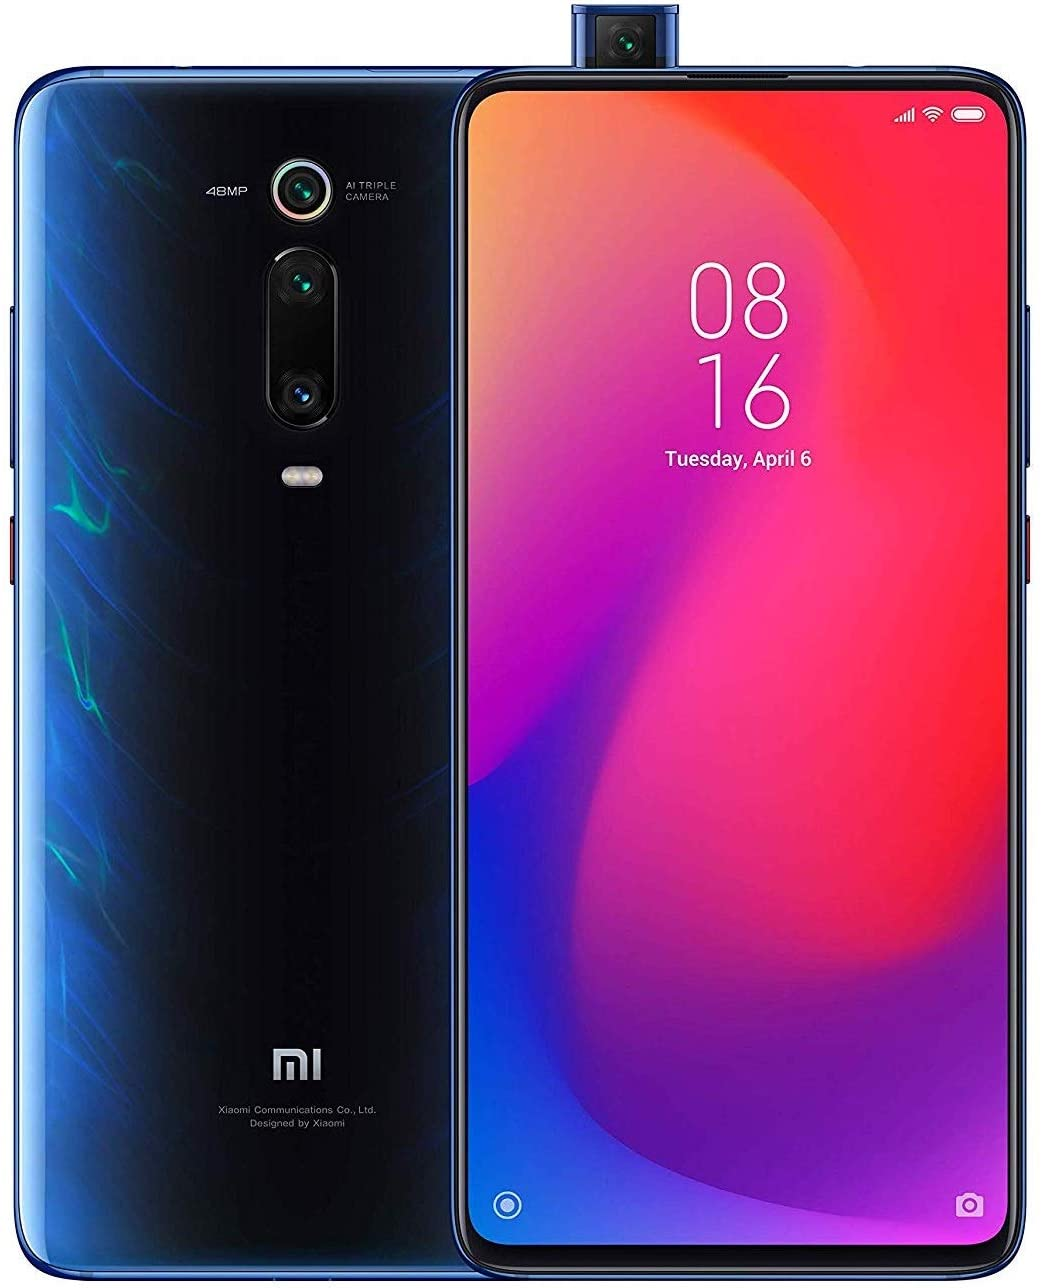 Xiaomi-Mi-9T-Pro-4 Offerta Xiaomi Mi 9T Pro a 435€, Miglior Smartphone Fascia Alta 2020